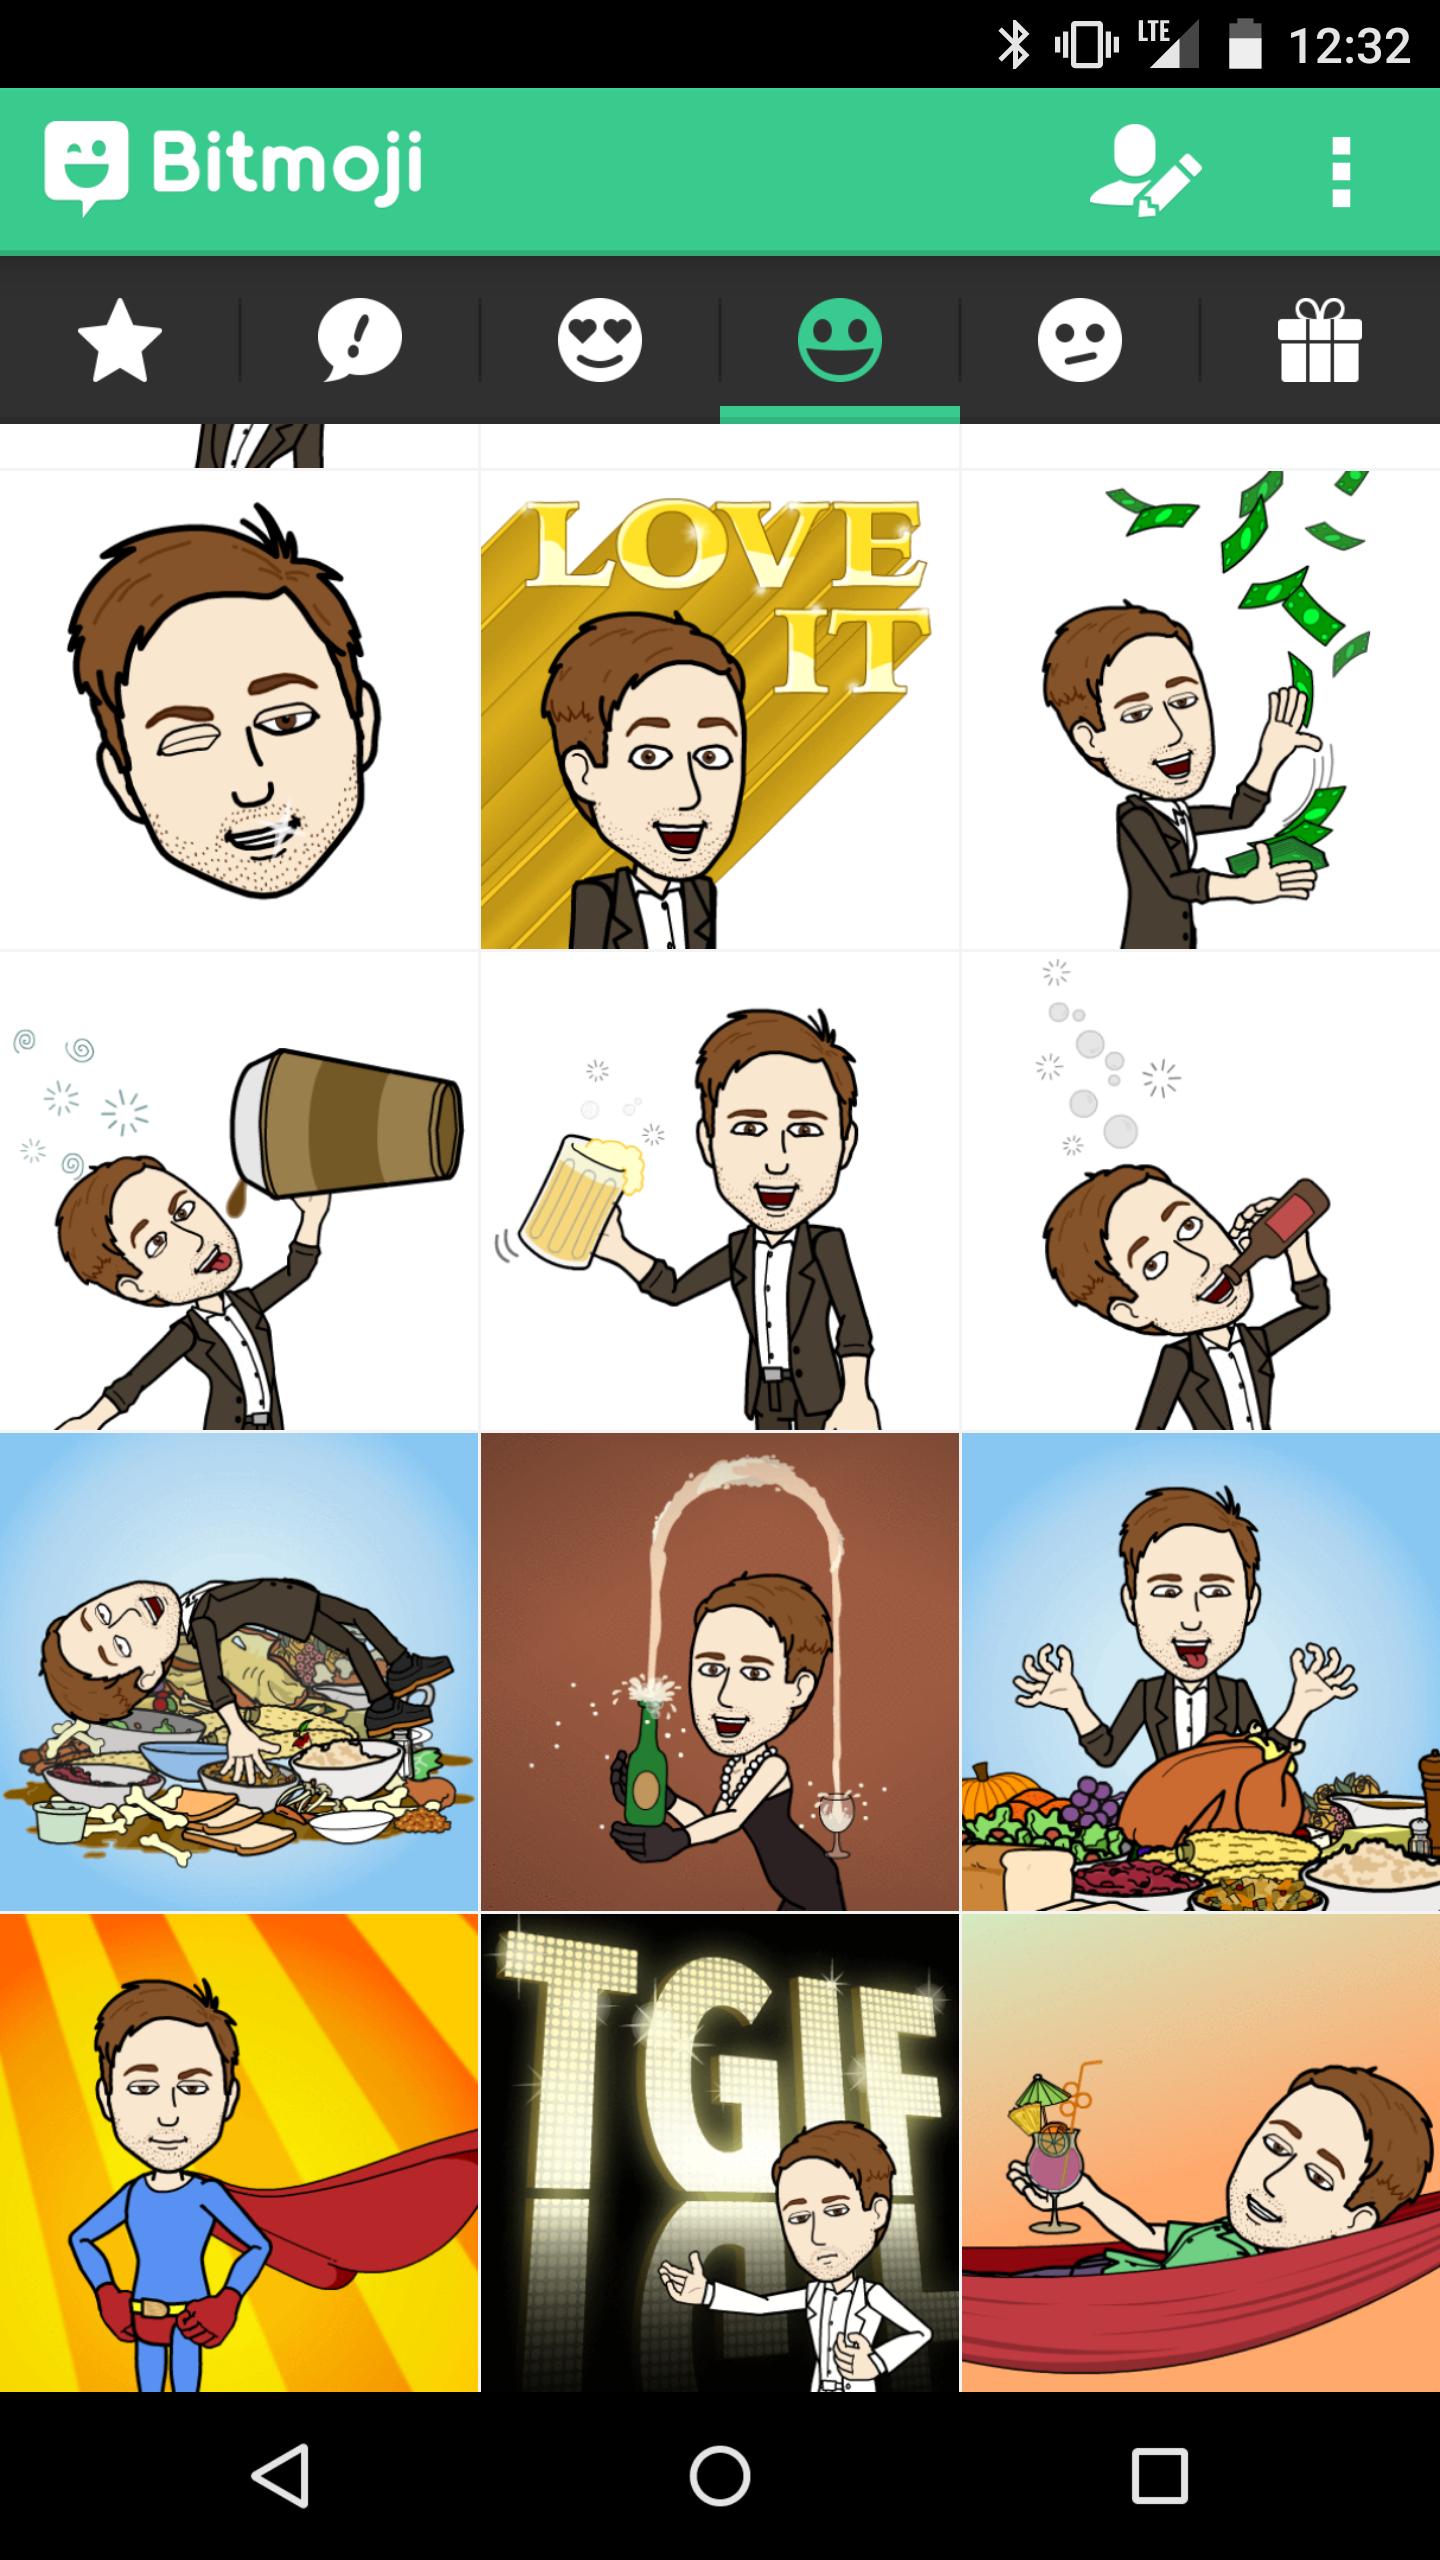 Create Your Own Emojis Using Bitmoji